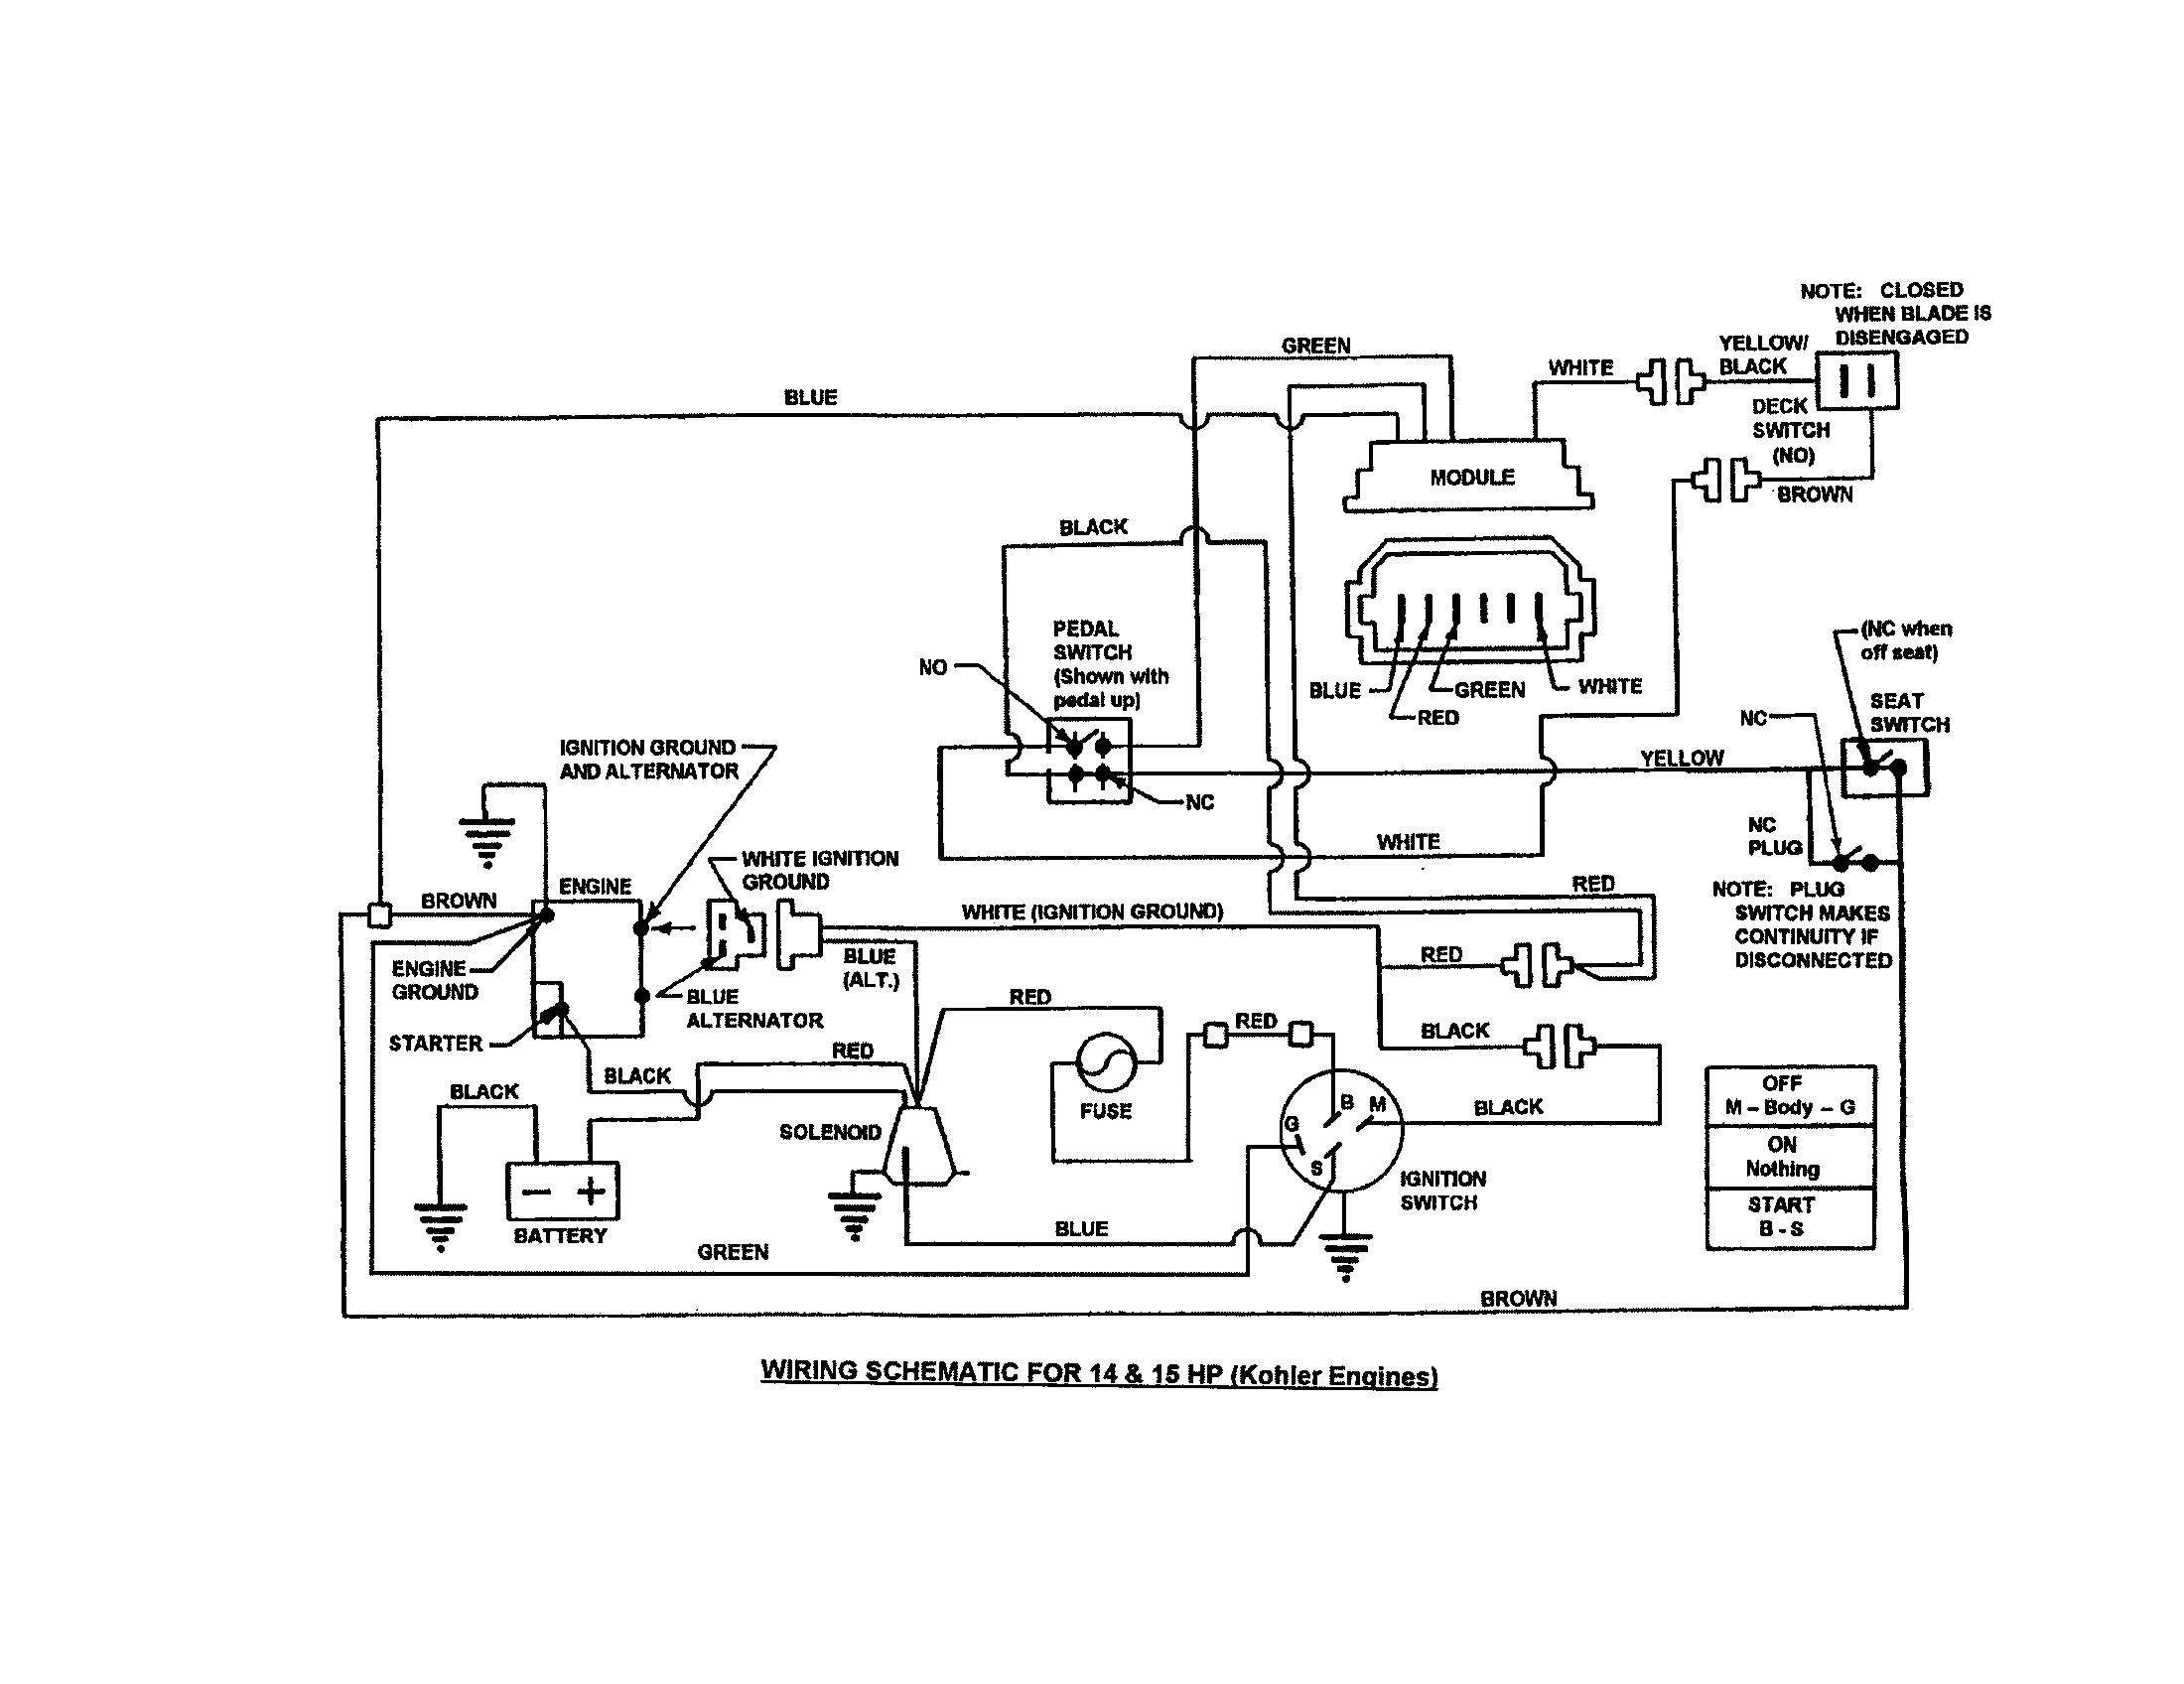 medium resolution of snapper 301022be wiring schematic 14 15 hp diagram